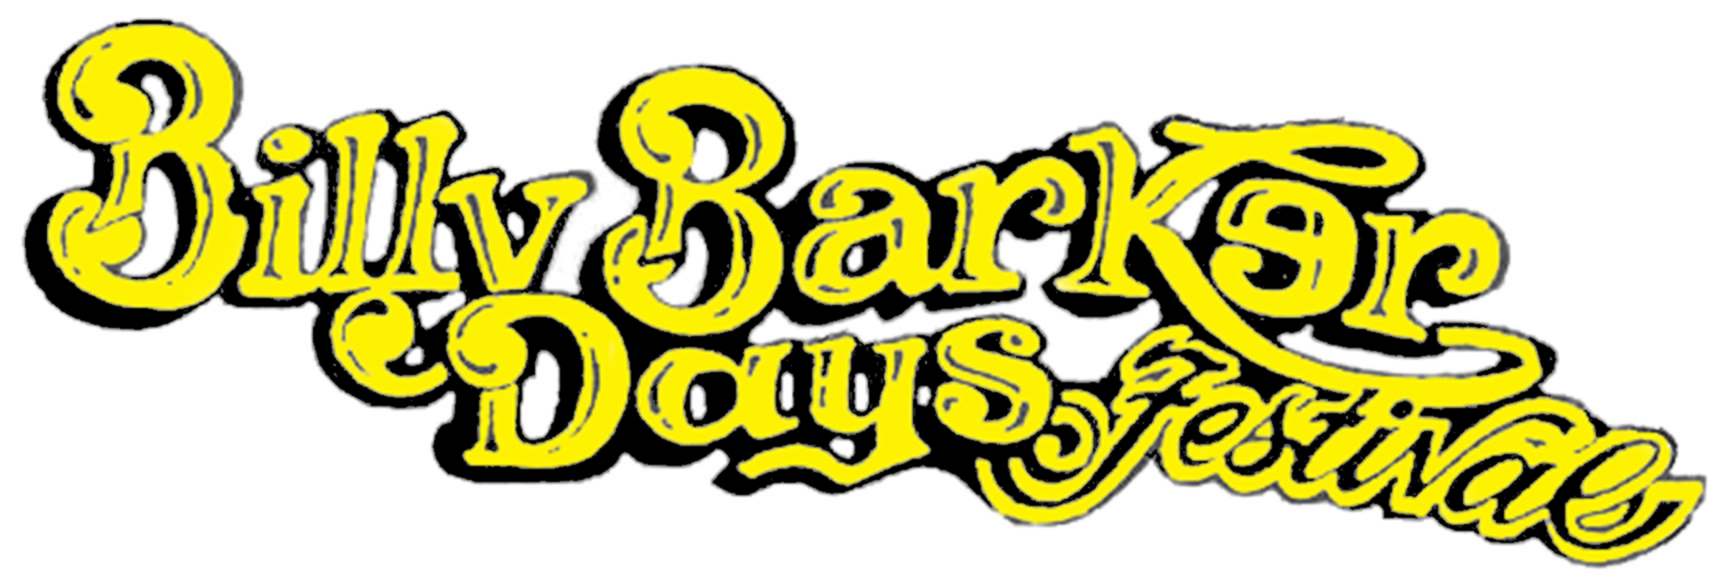 BBDays Logo yellow